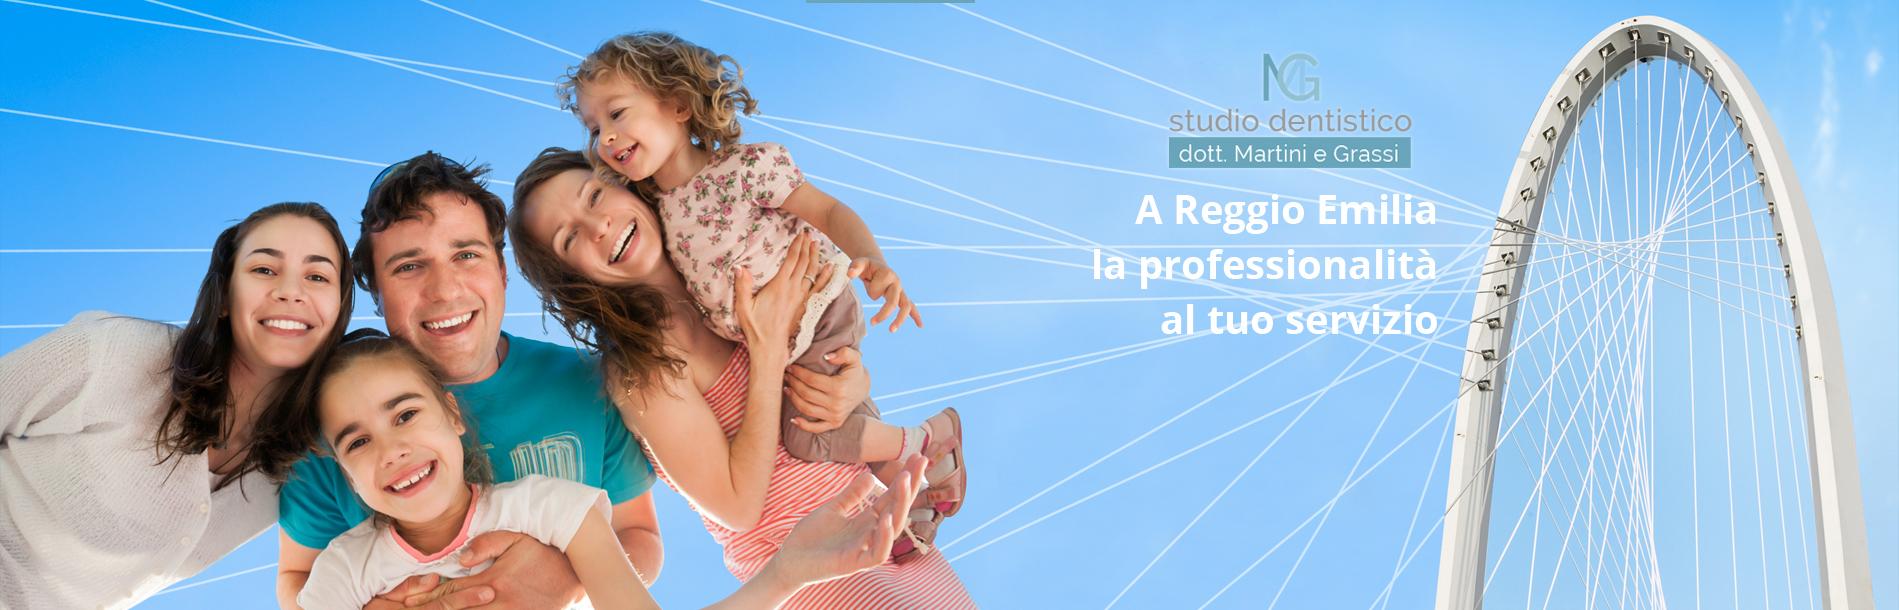 Studio Dentistico Reggio Emilia